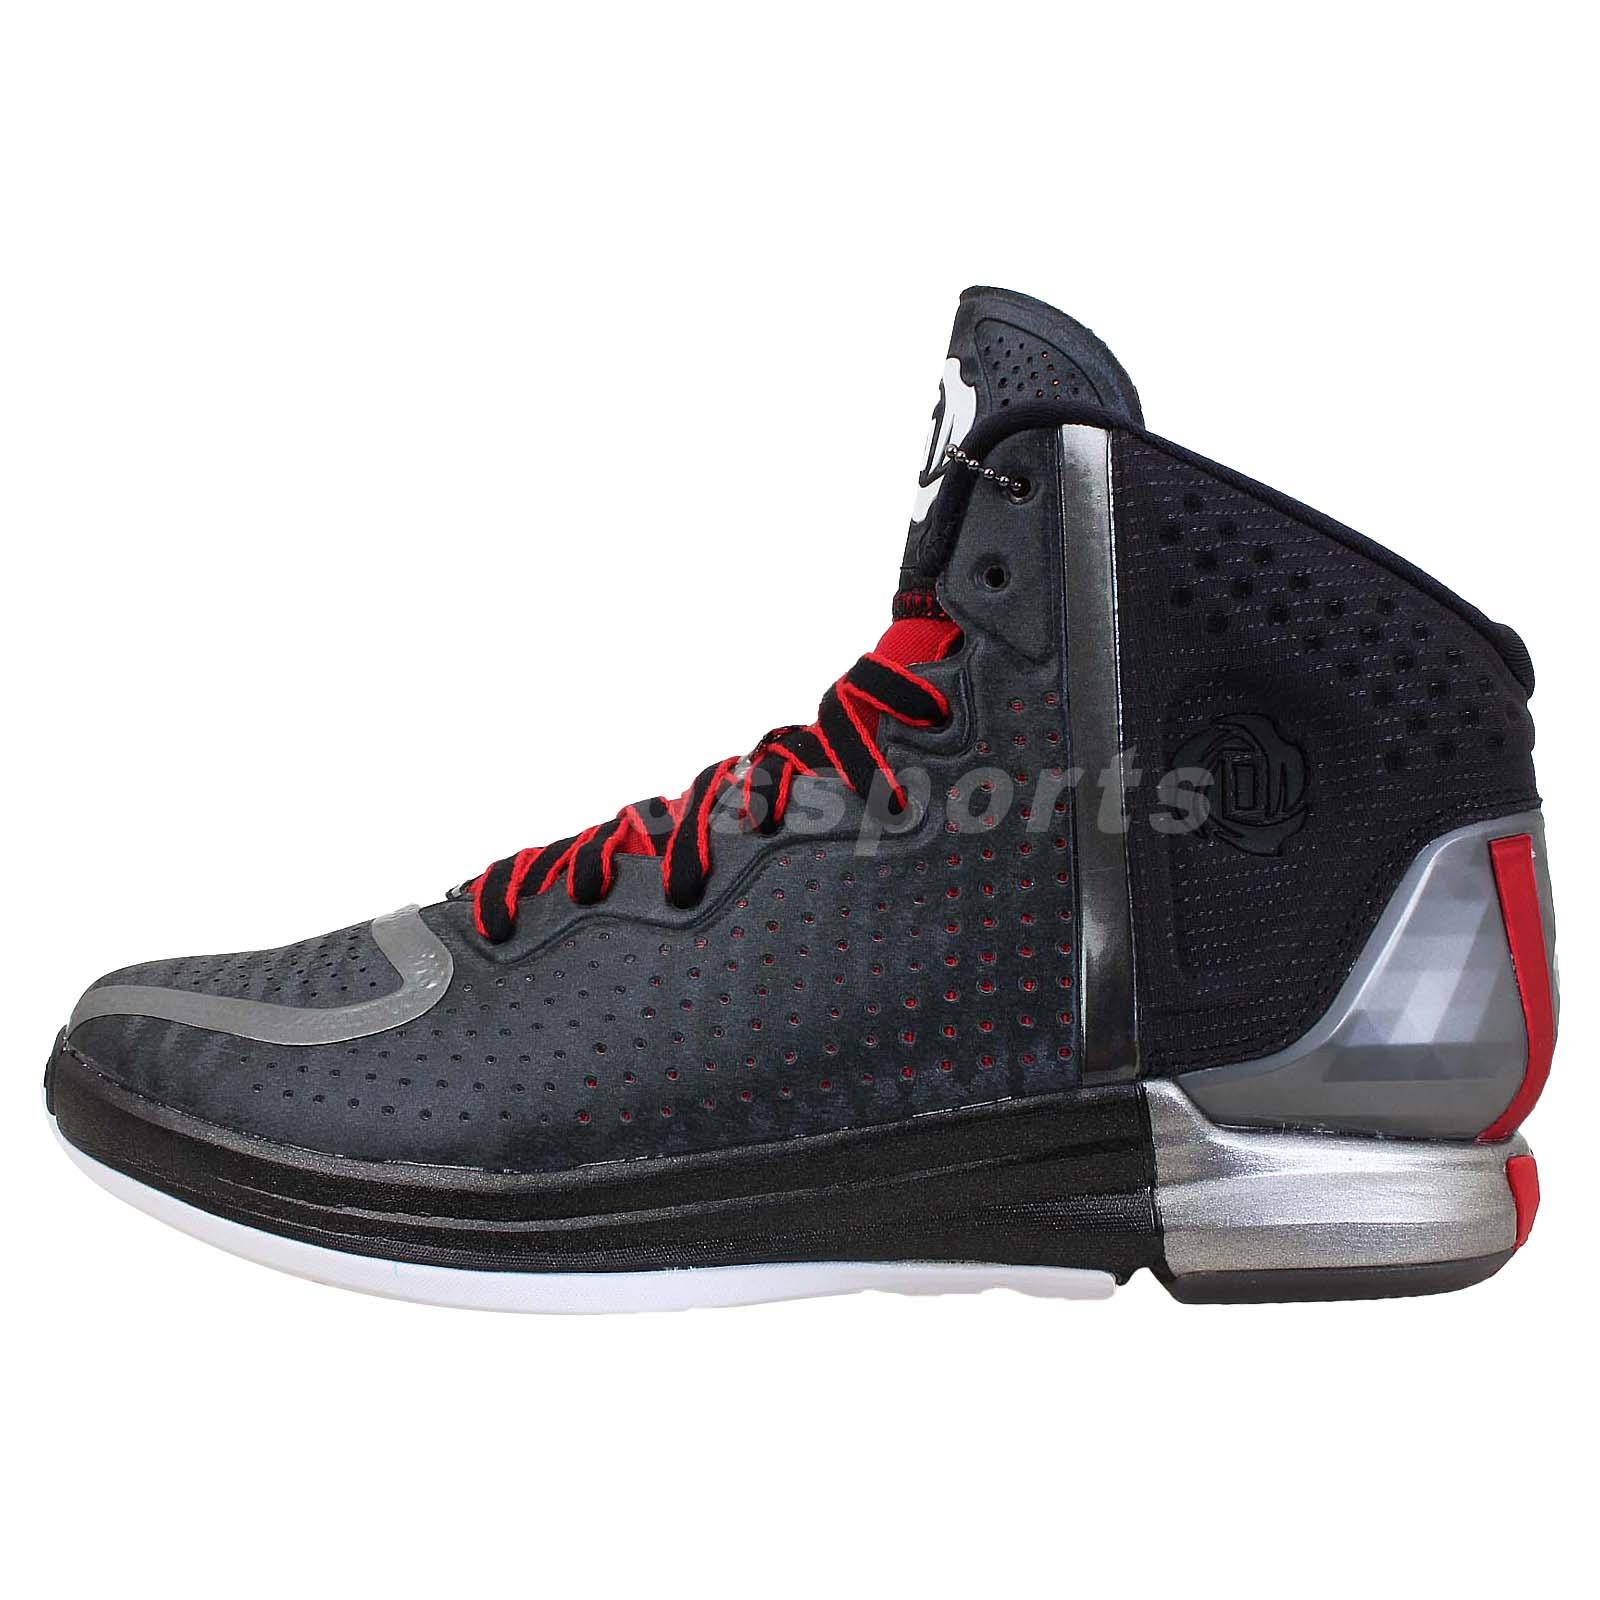 Adidas D Rose 4 Derrick Chicago Bulls 2013 Mens Basketball ...